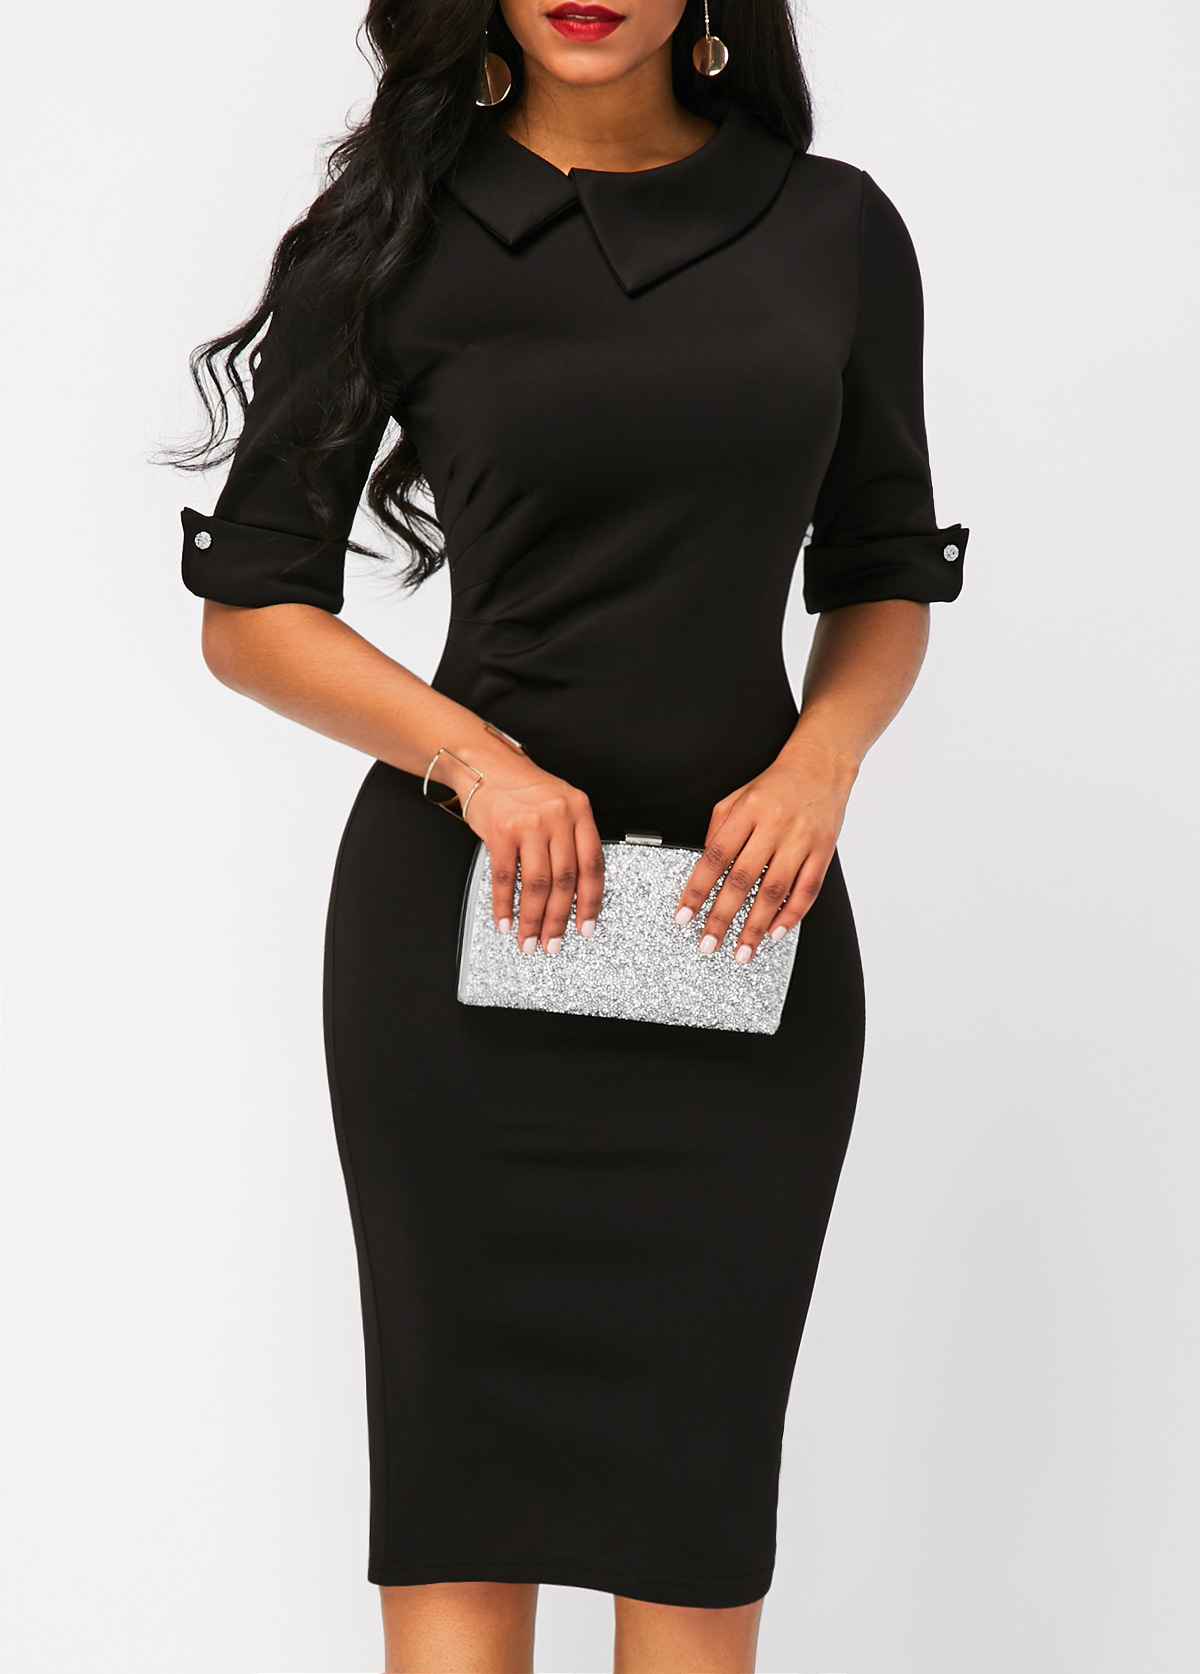 Black Half Sleeve Zipper Back Sheath Dress